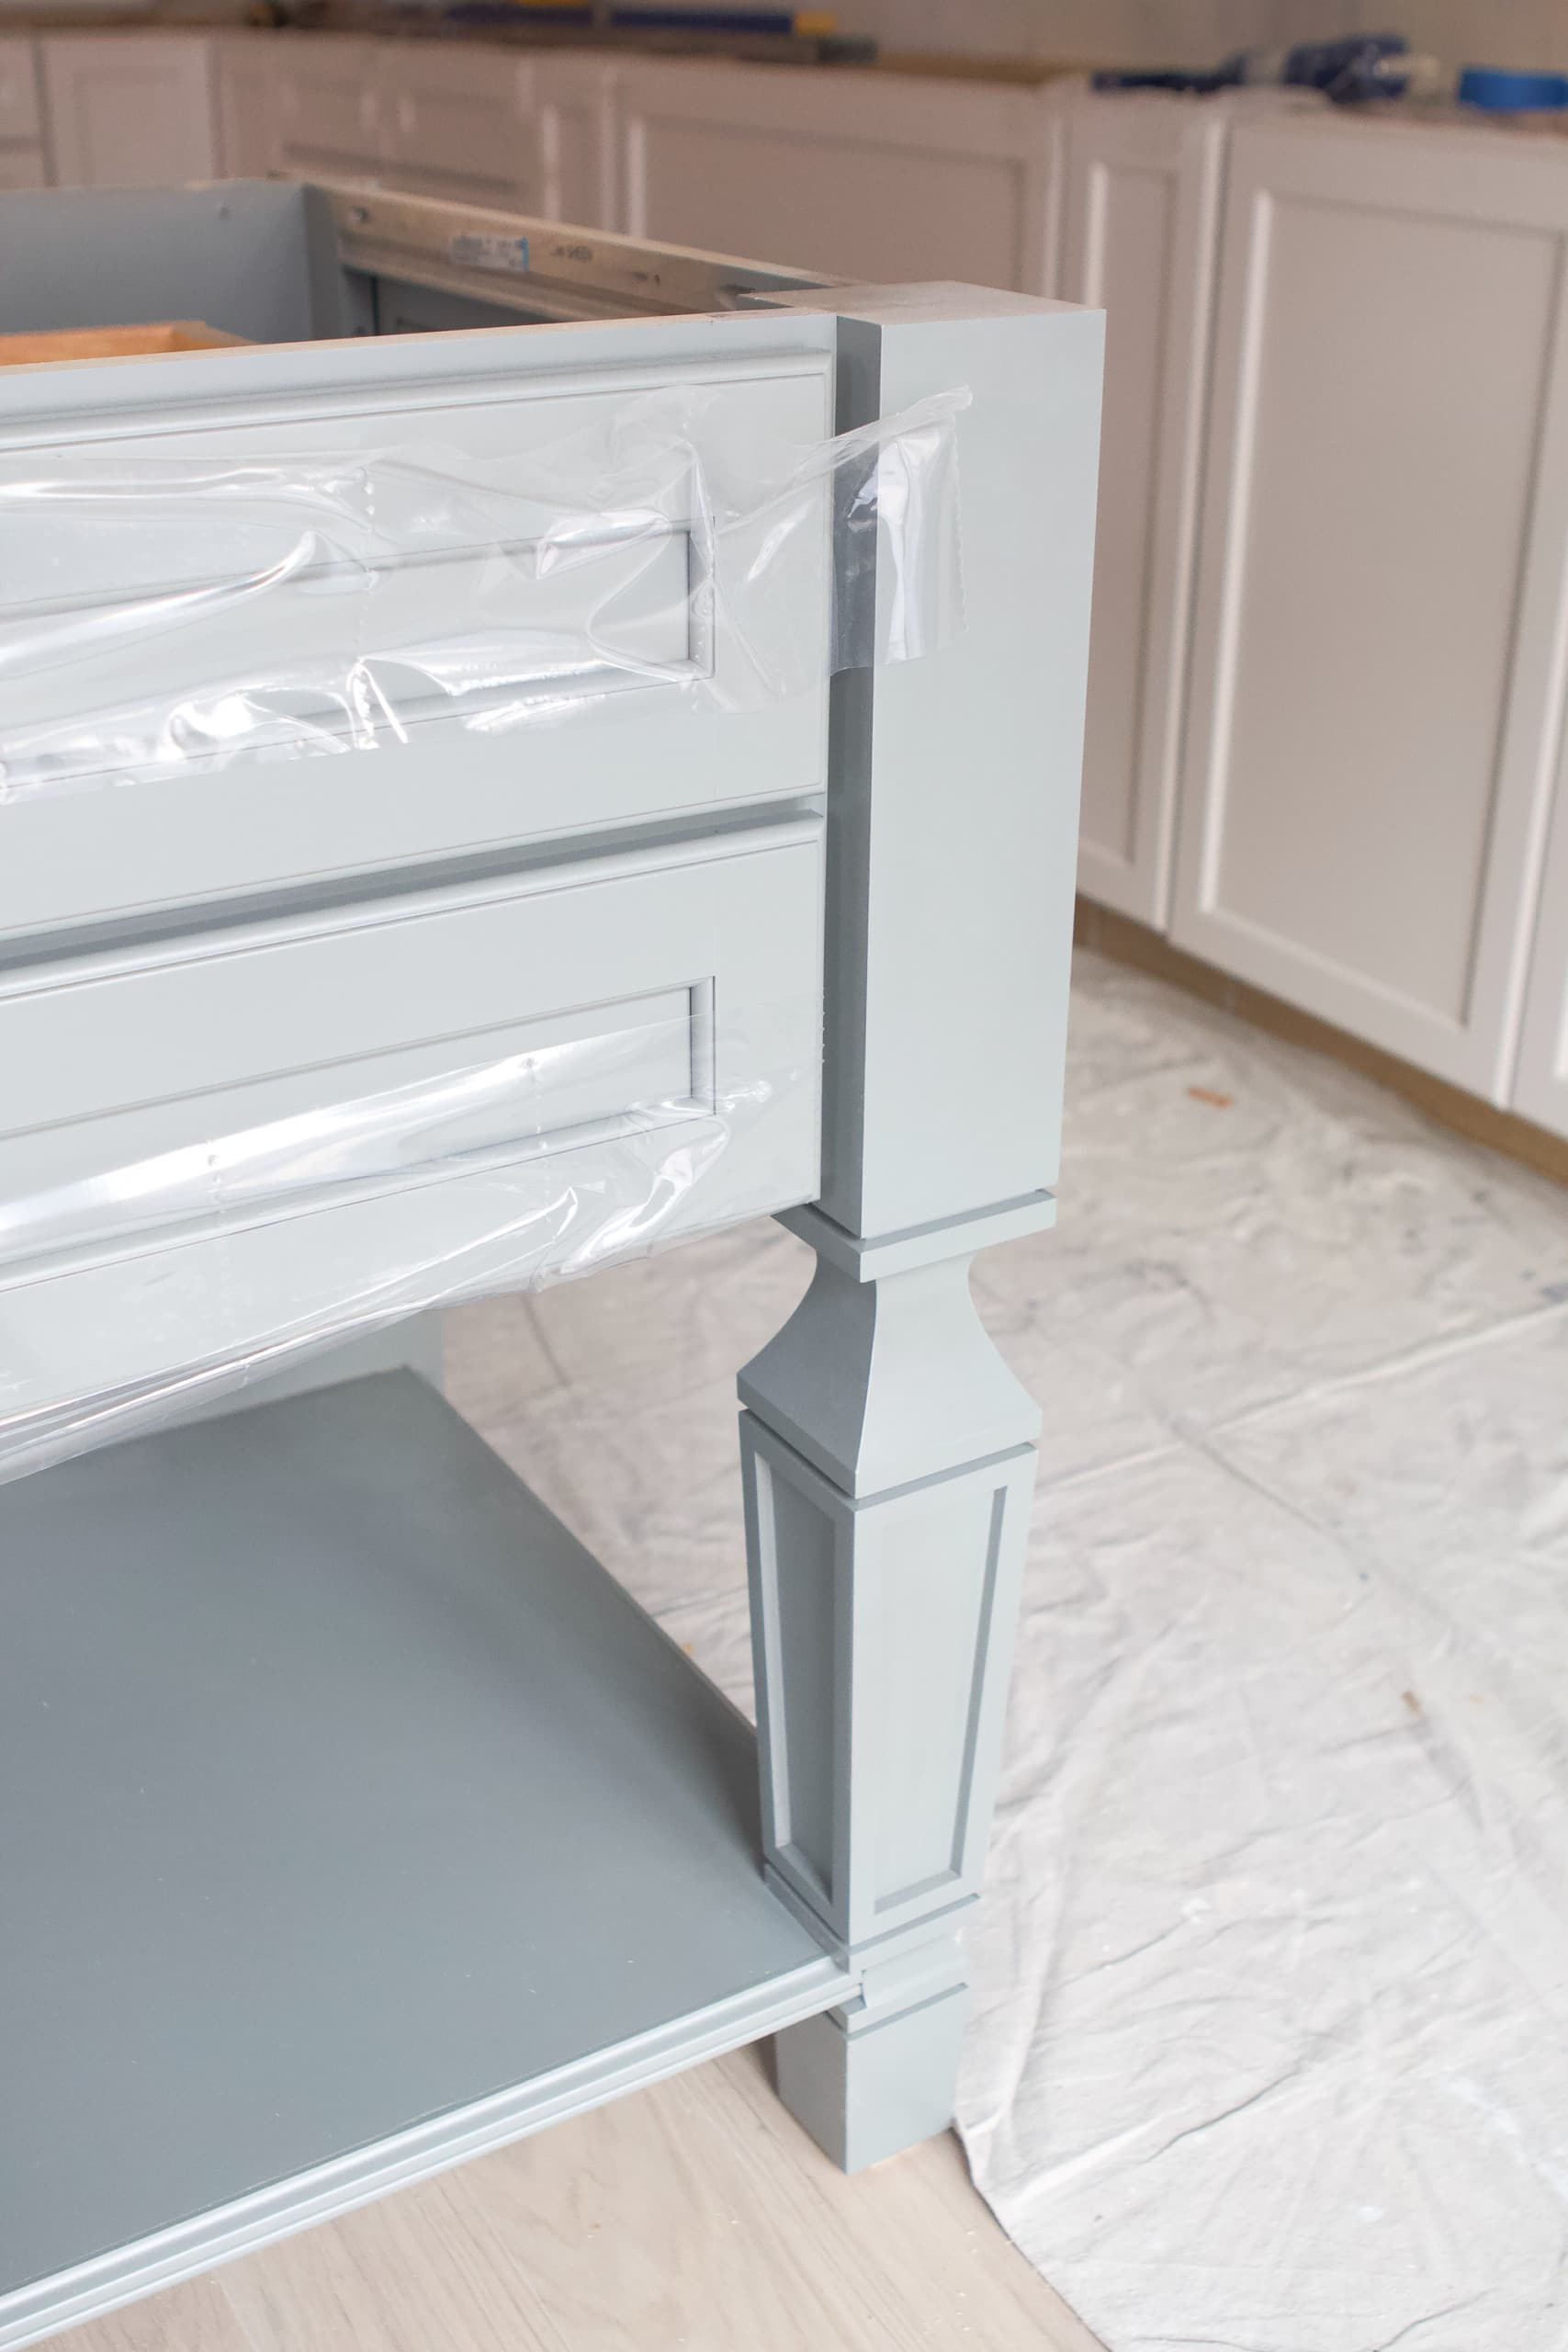 Decorative legs on a kitchen cabinet